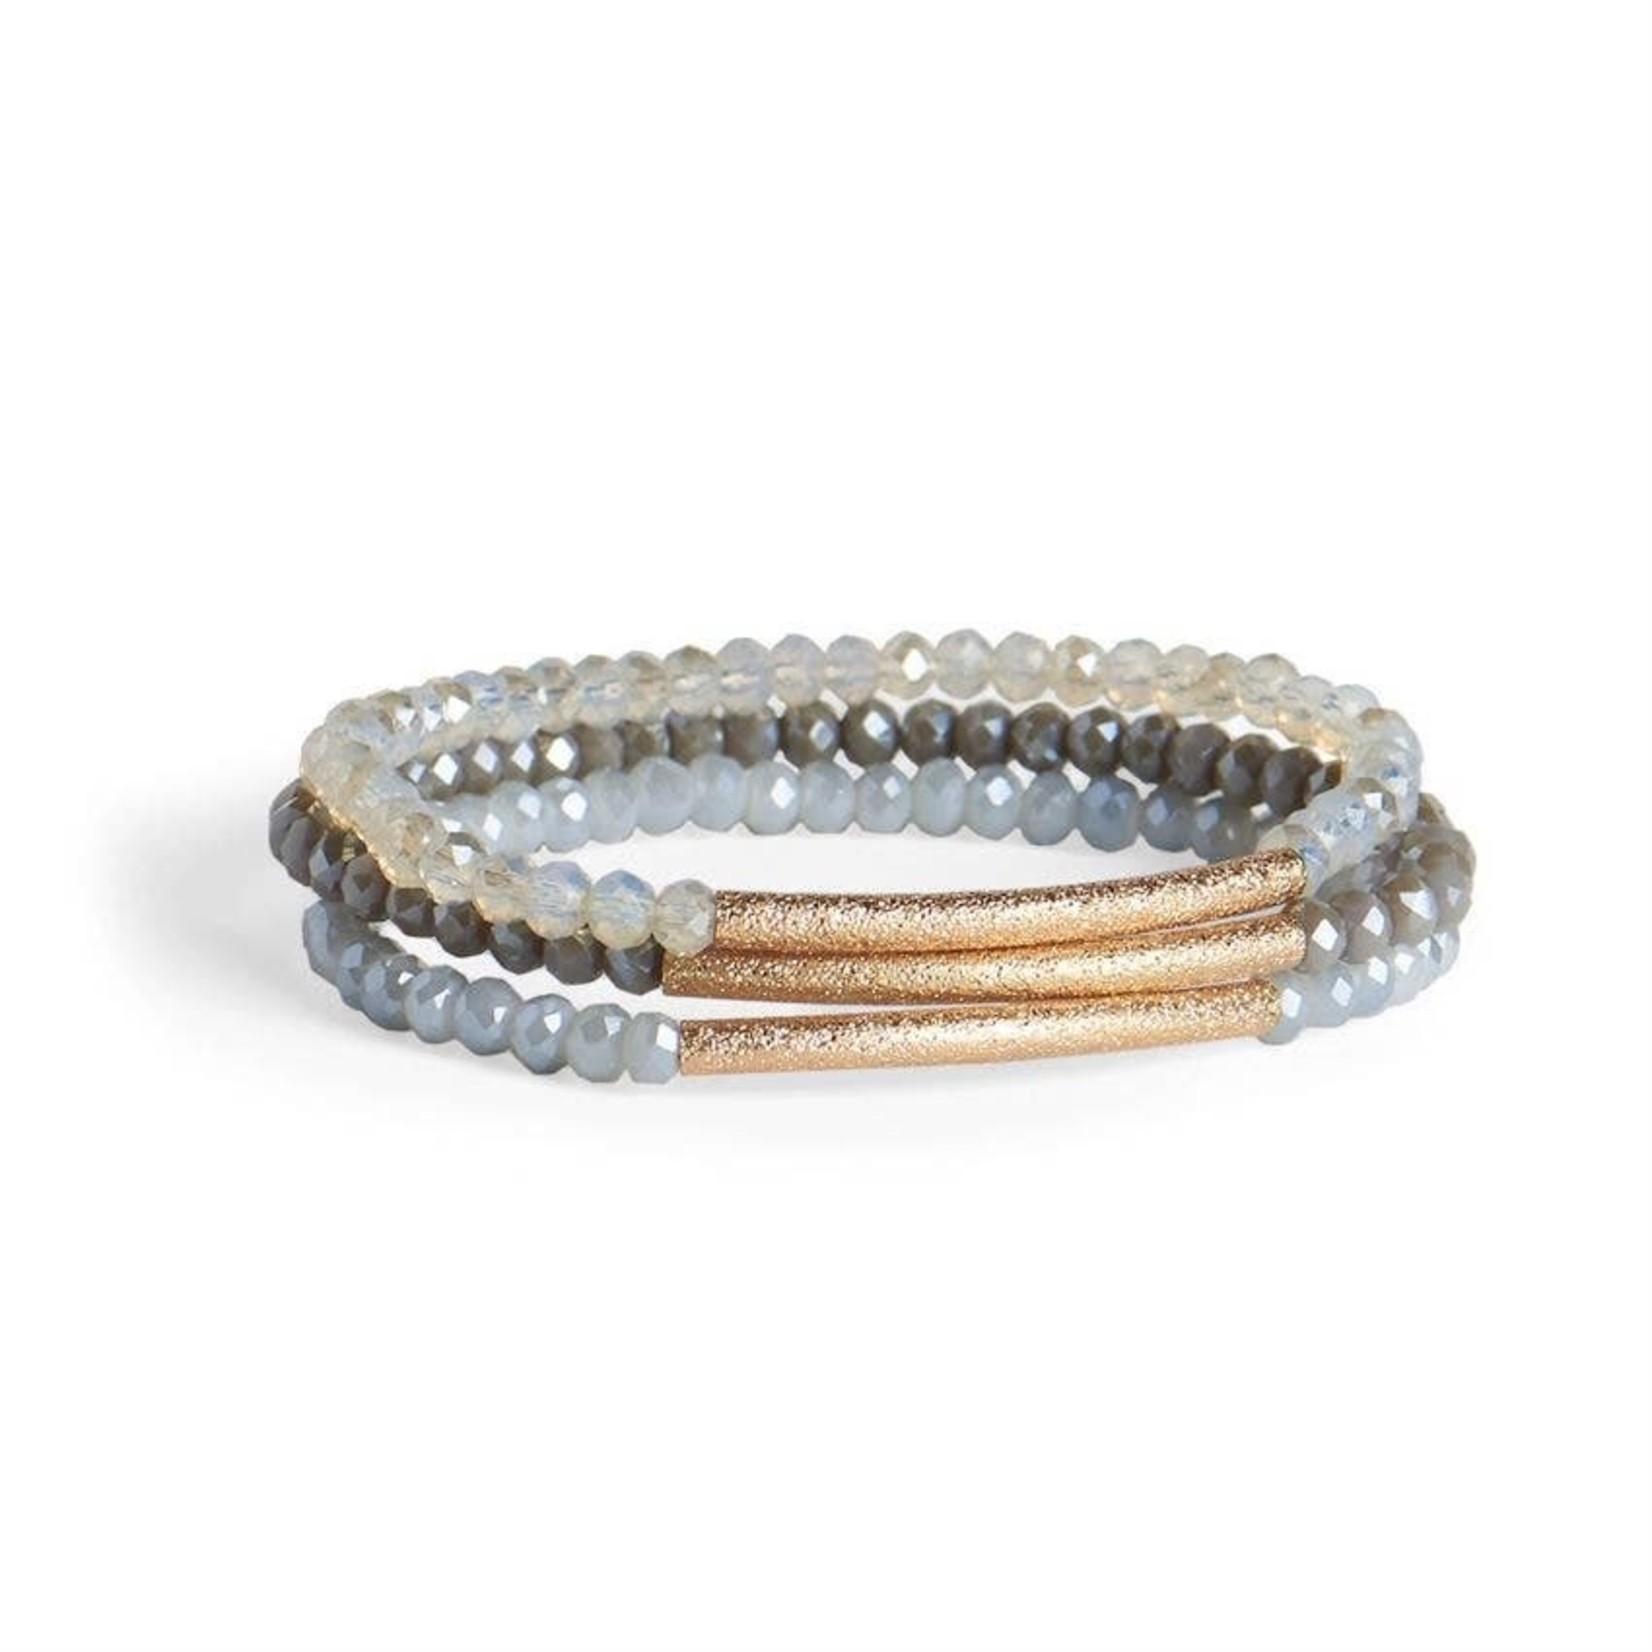 Coco+Carmen Accessories: Shimmering Bar Bracelet Set